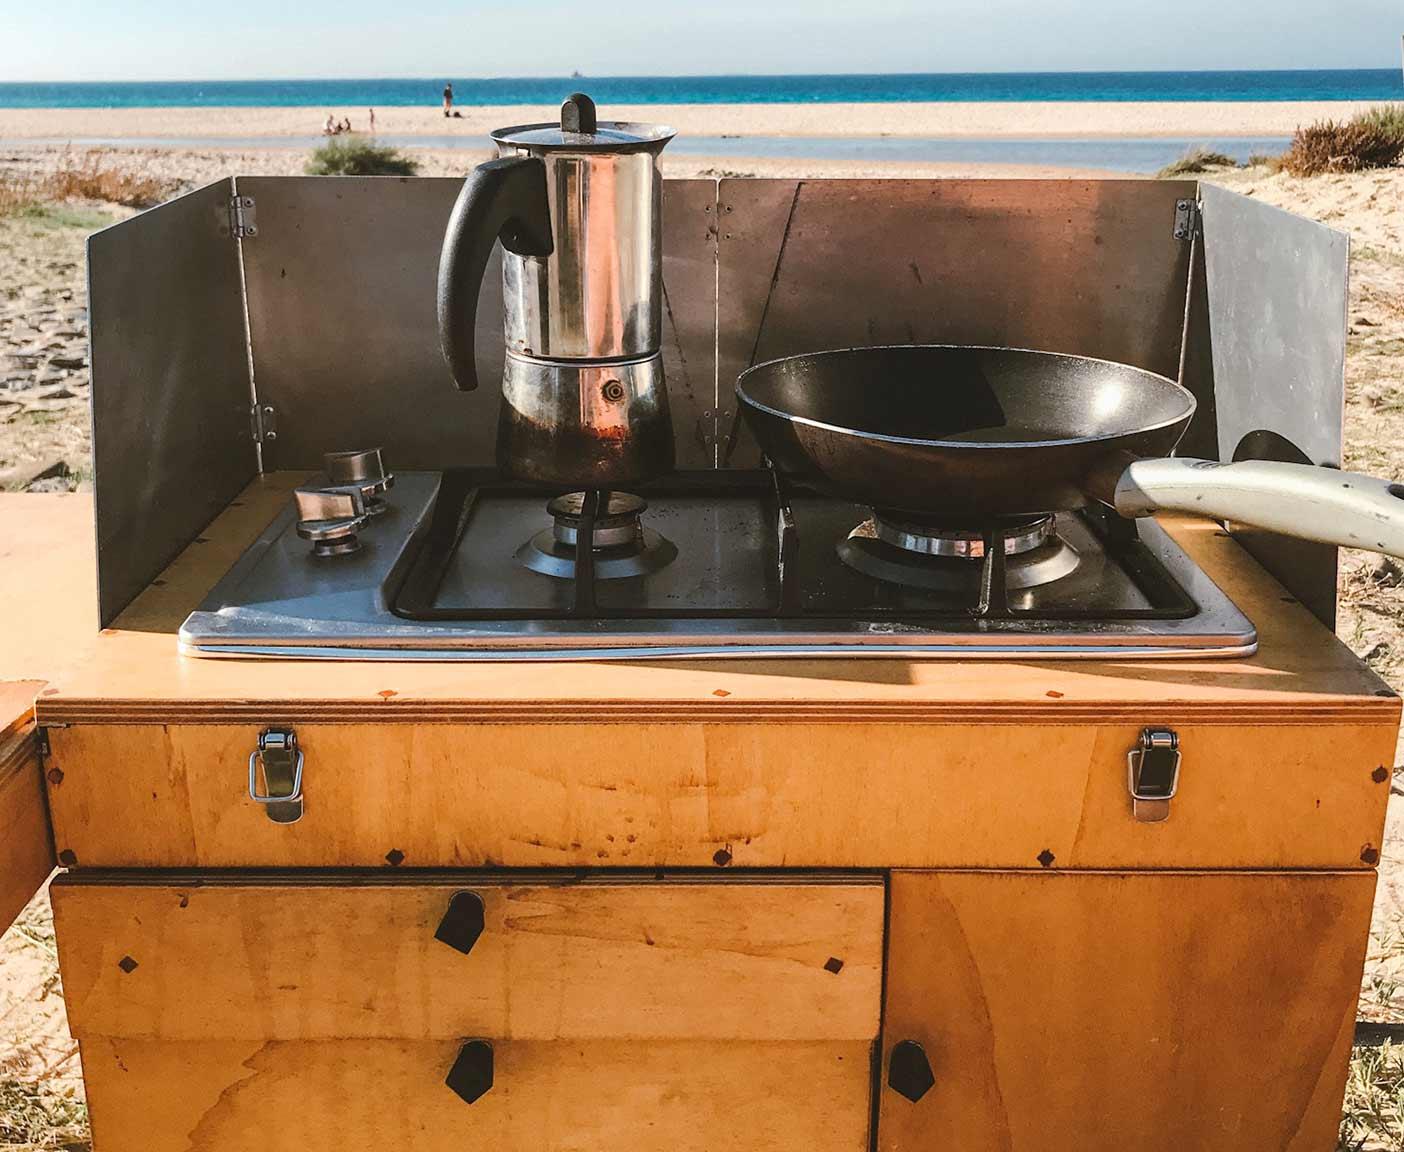 camper-van-4x4-kochen-draussen